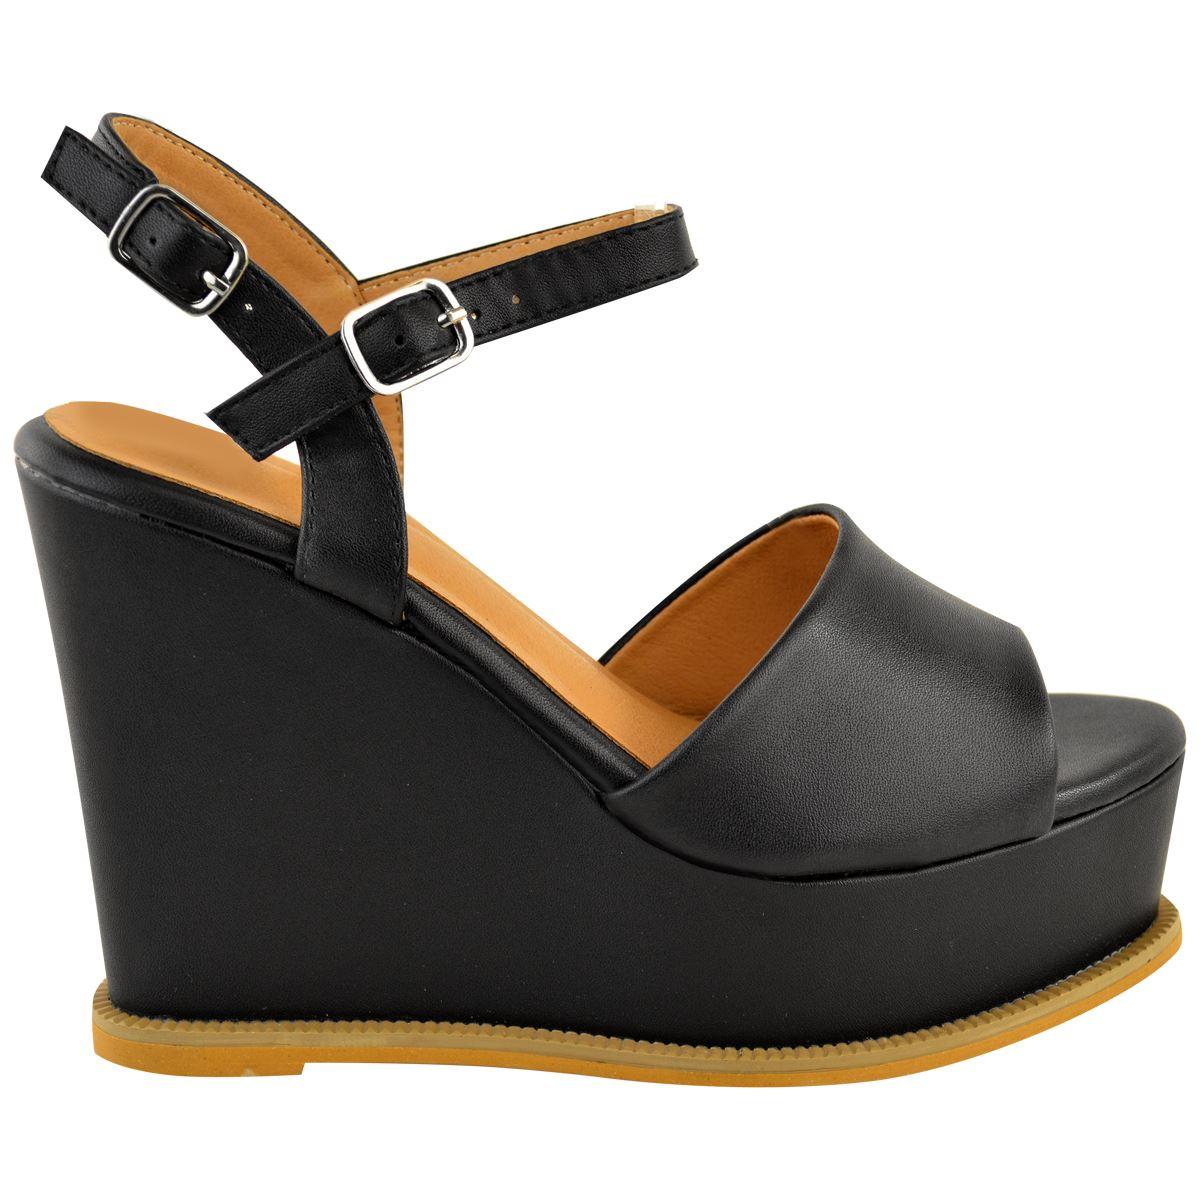 Womens High Mid Heel Wedge Sandals